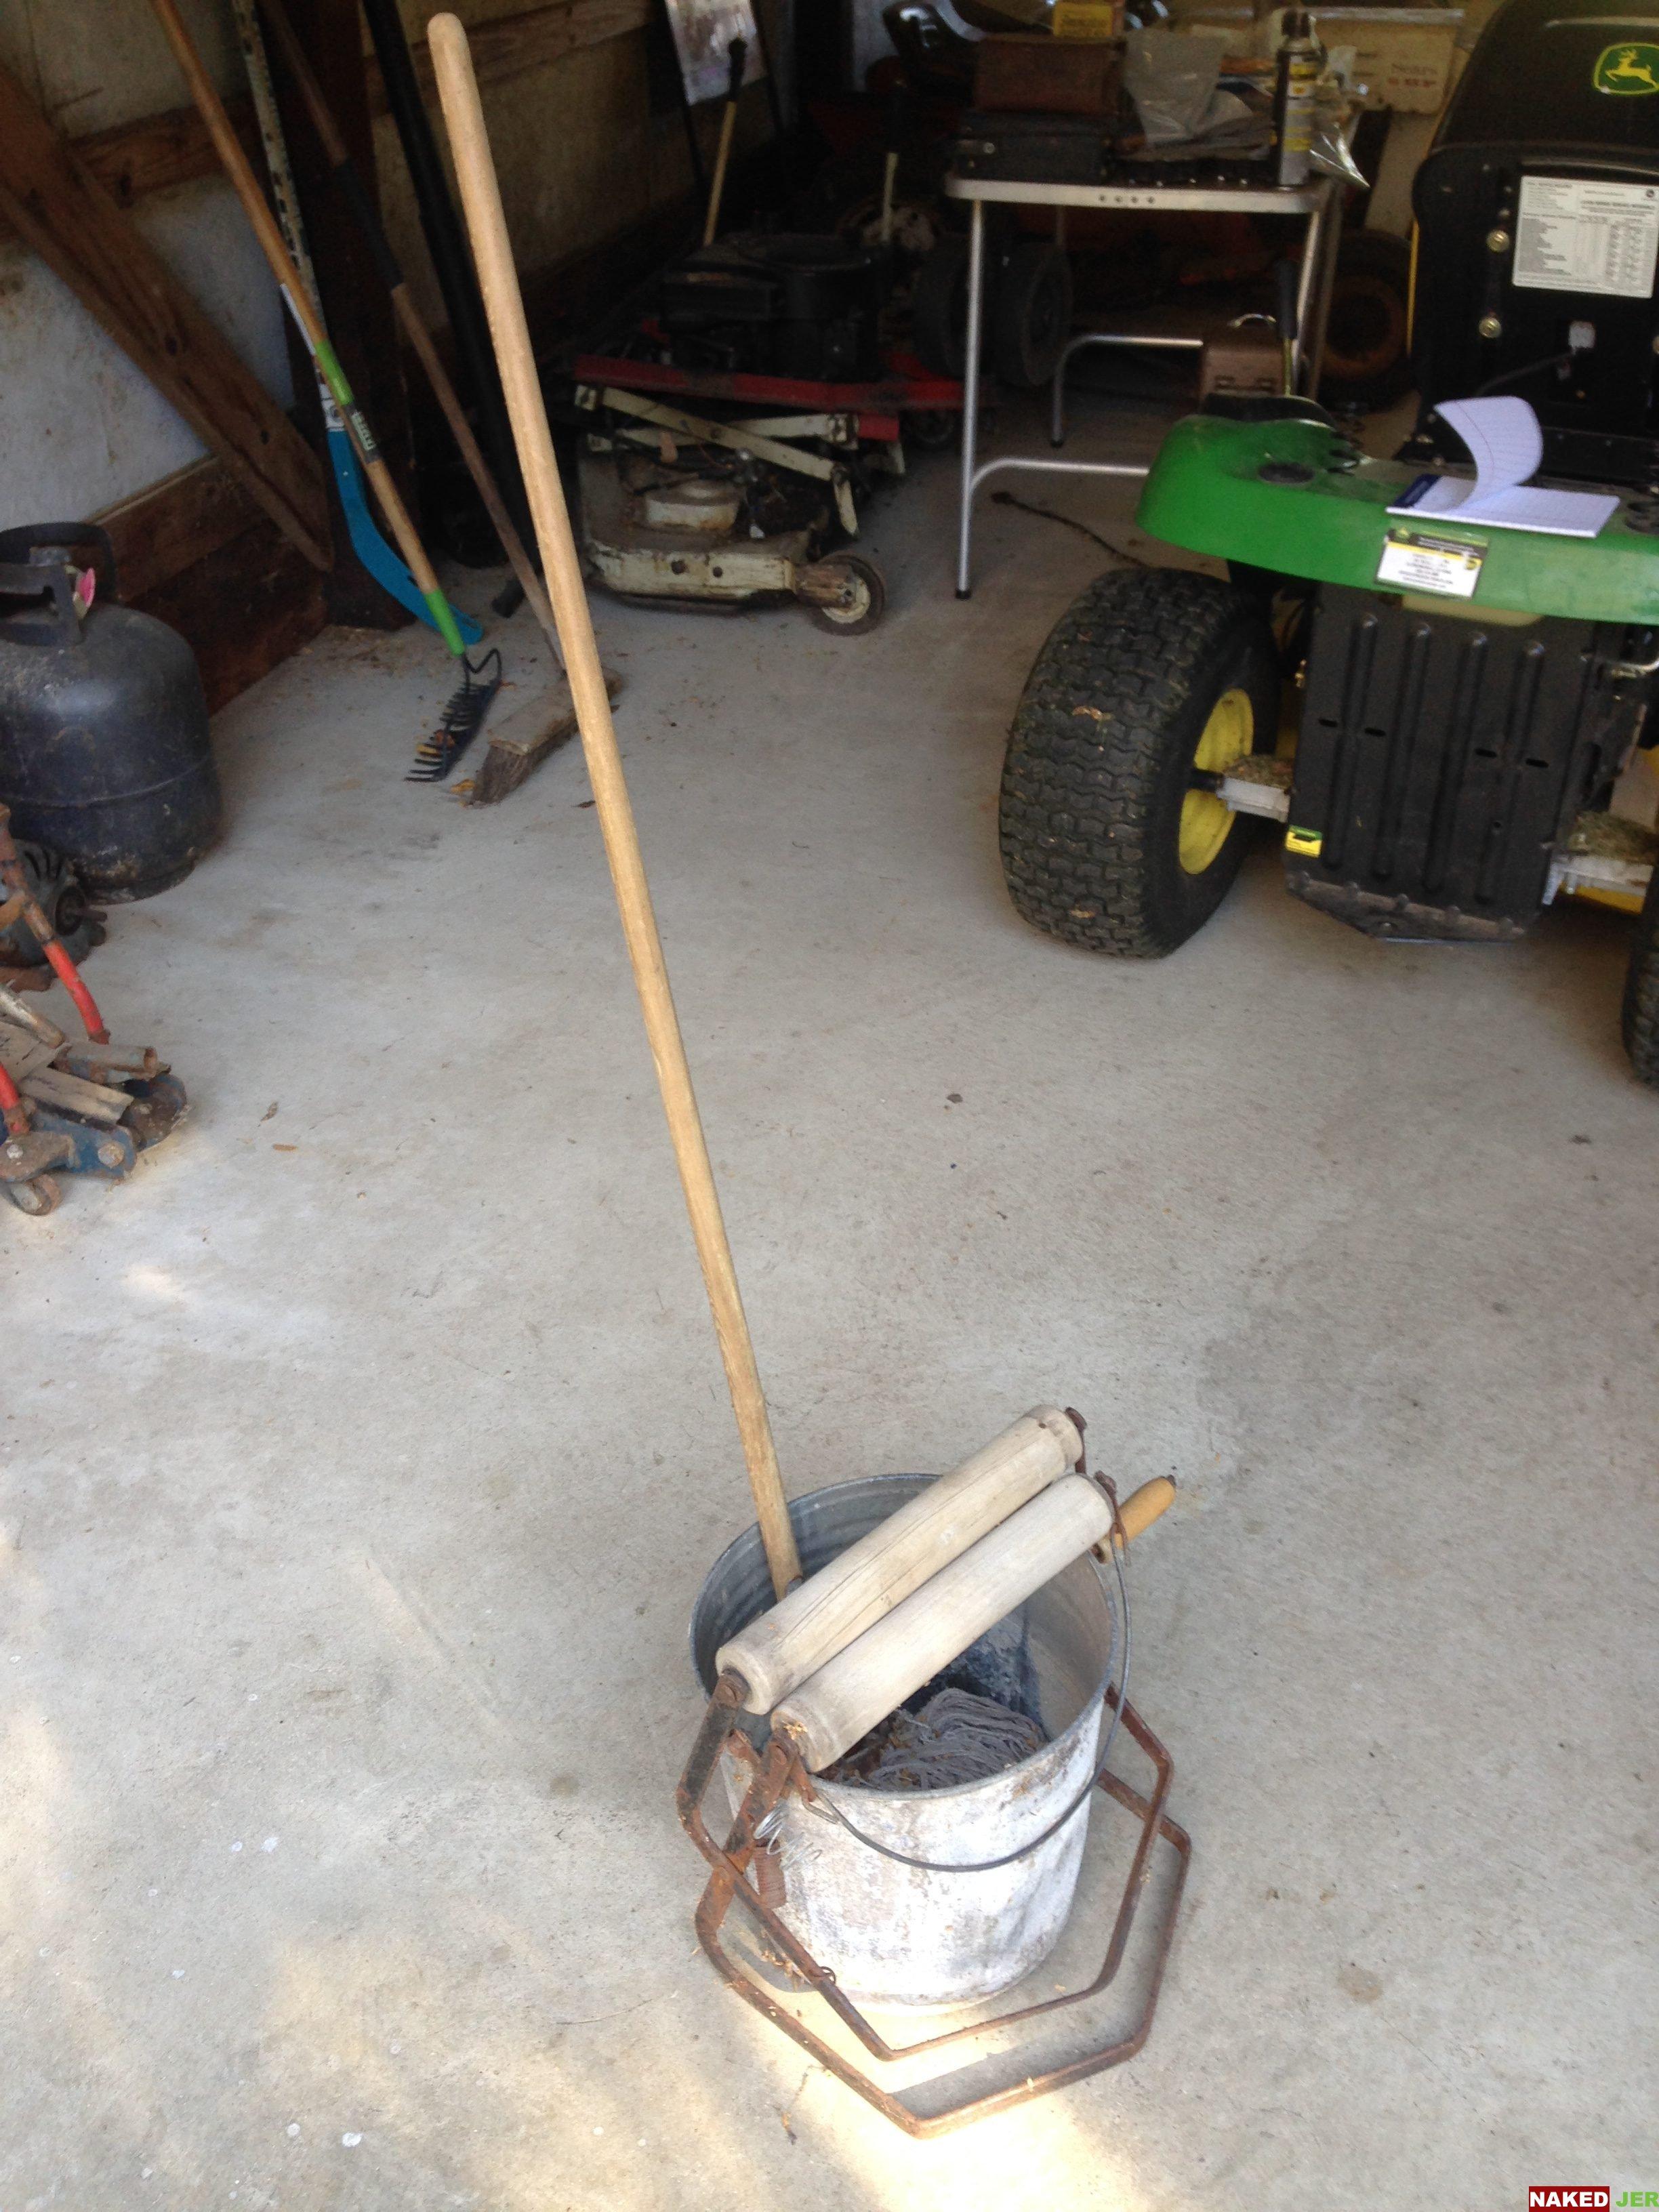 Vintage Mop bucket/ringer w/mop $4